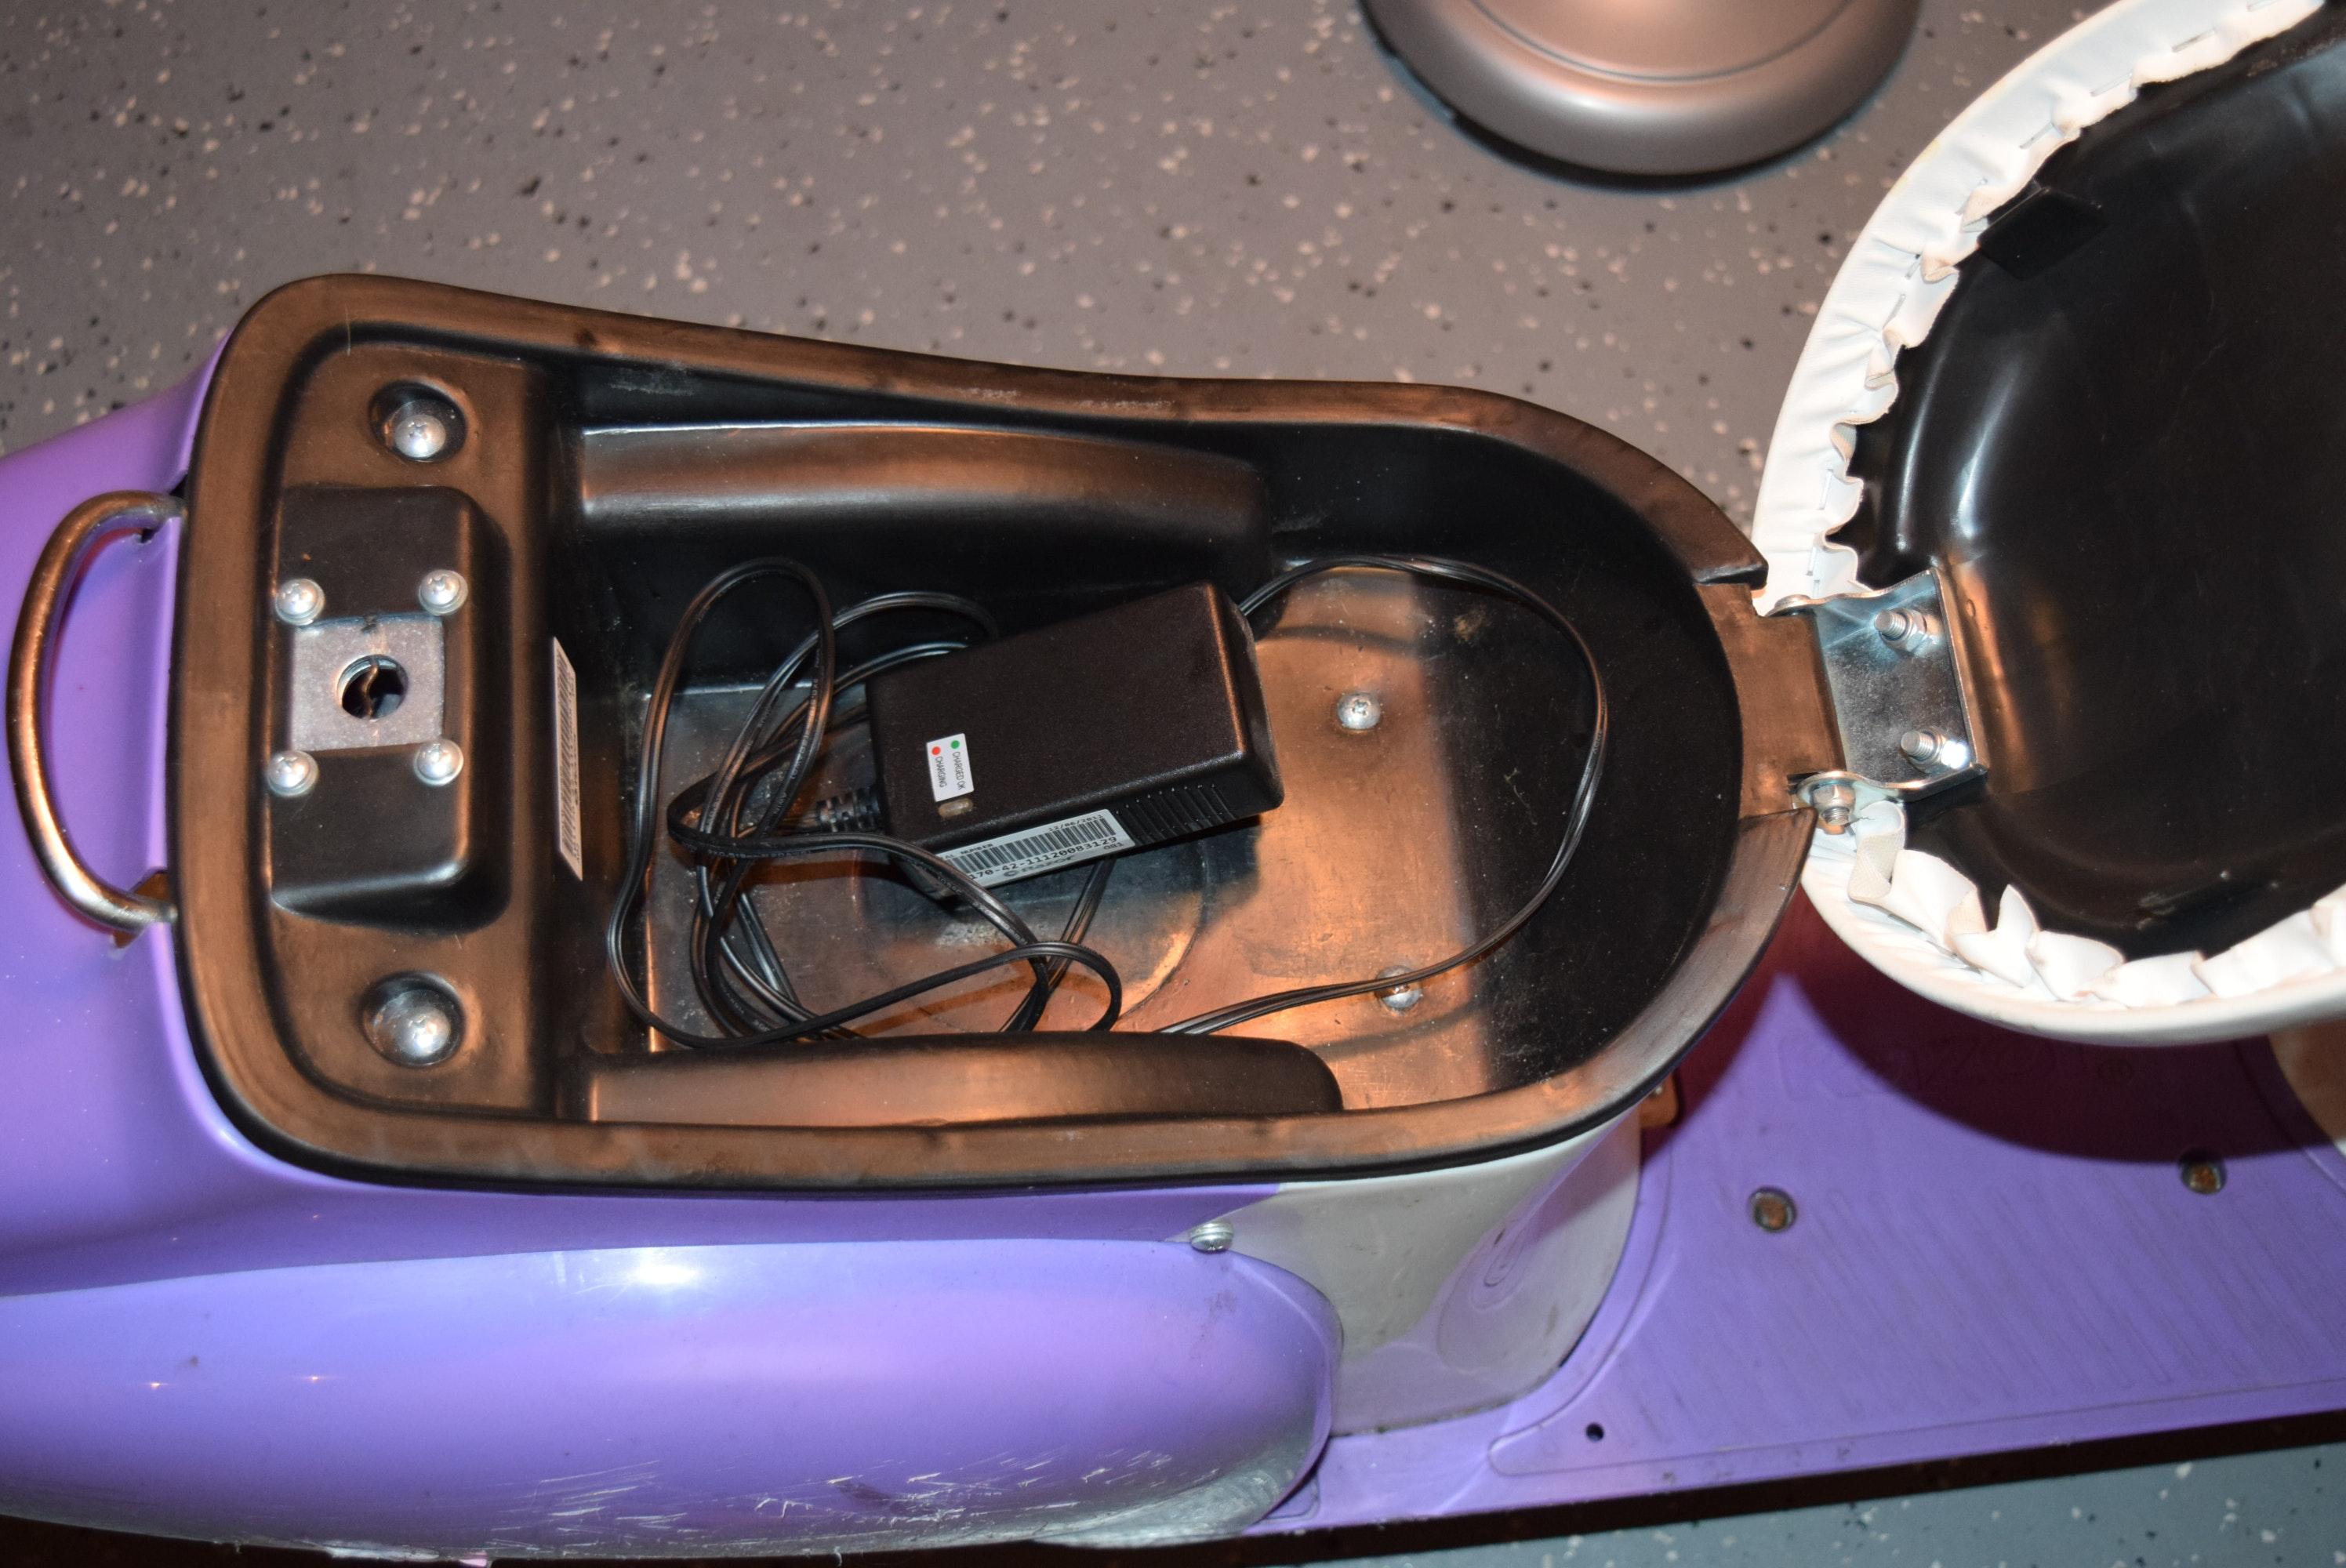 Razor Pocket Mod Betty Motorized Electric Scooter Ebth